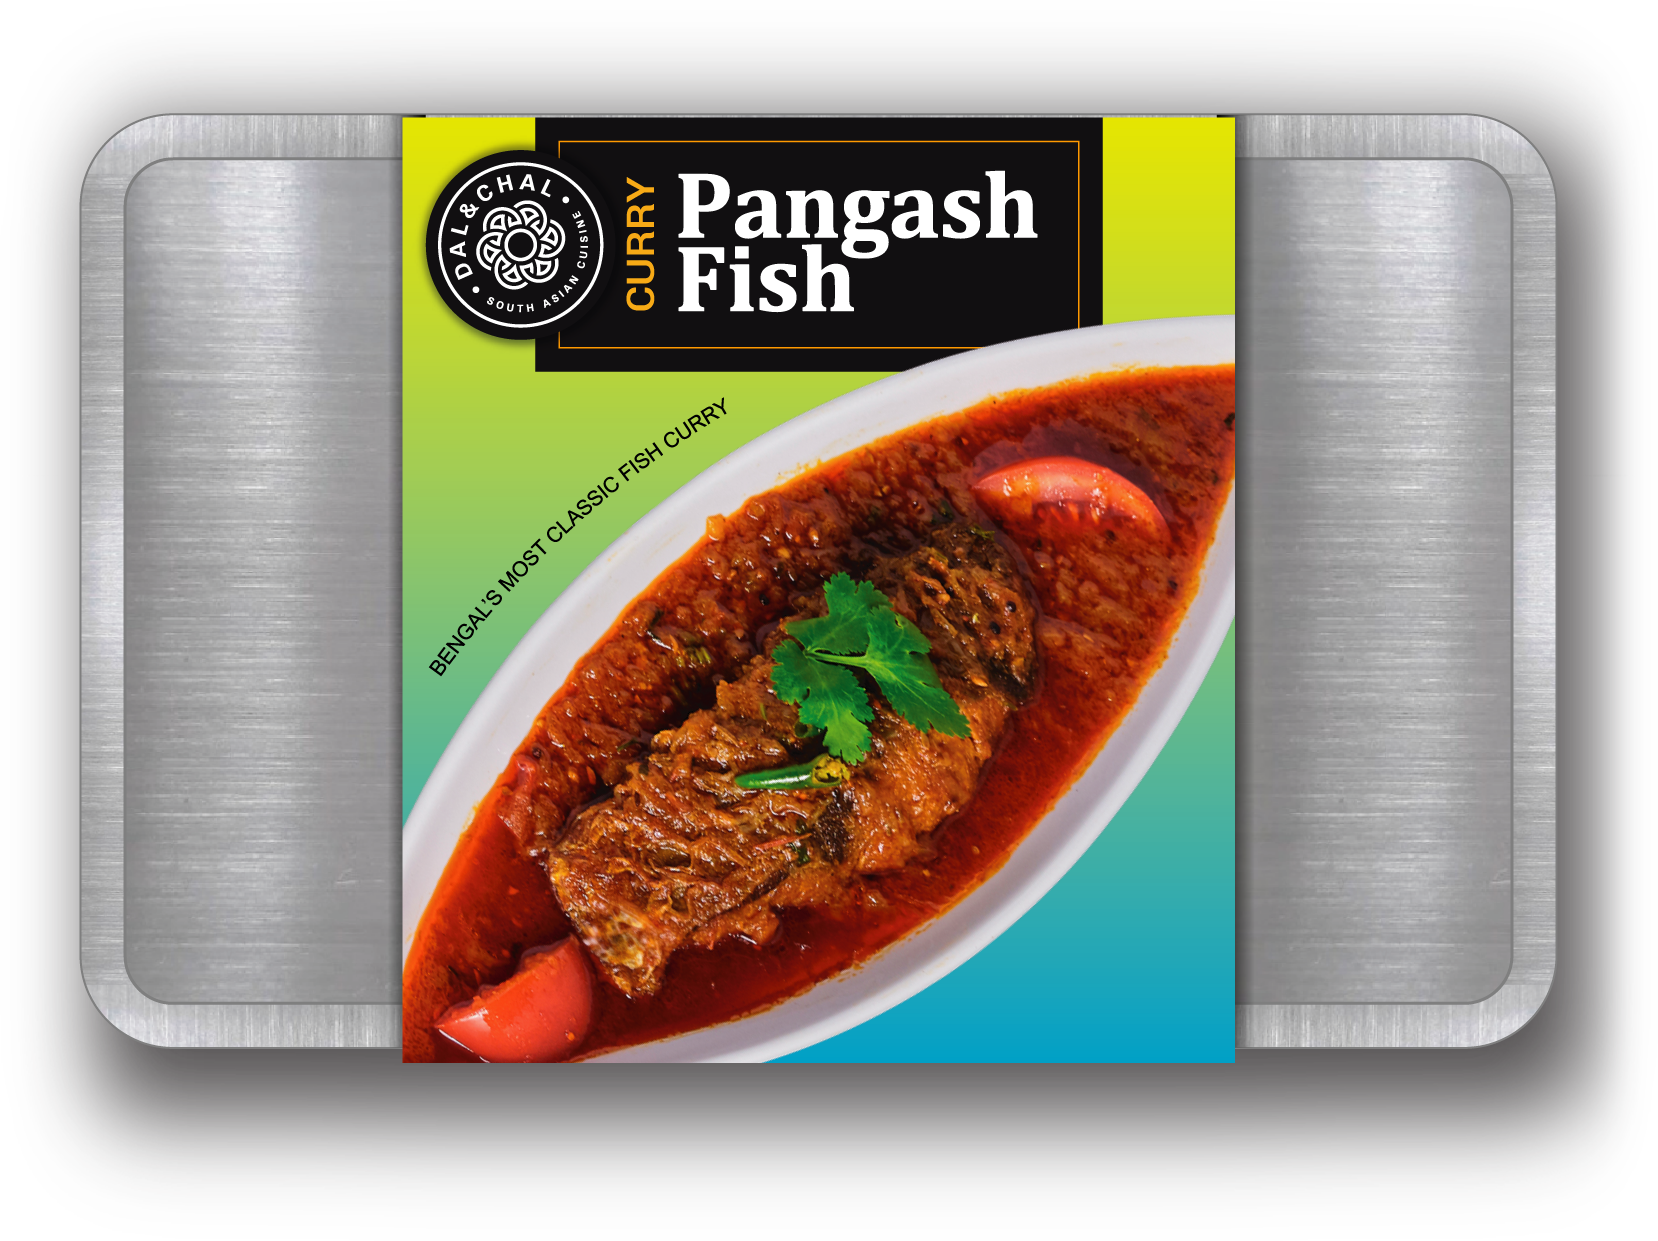 PANGASH FISH